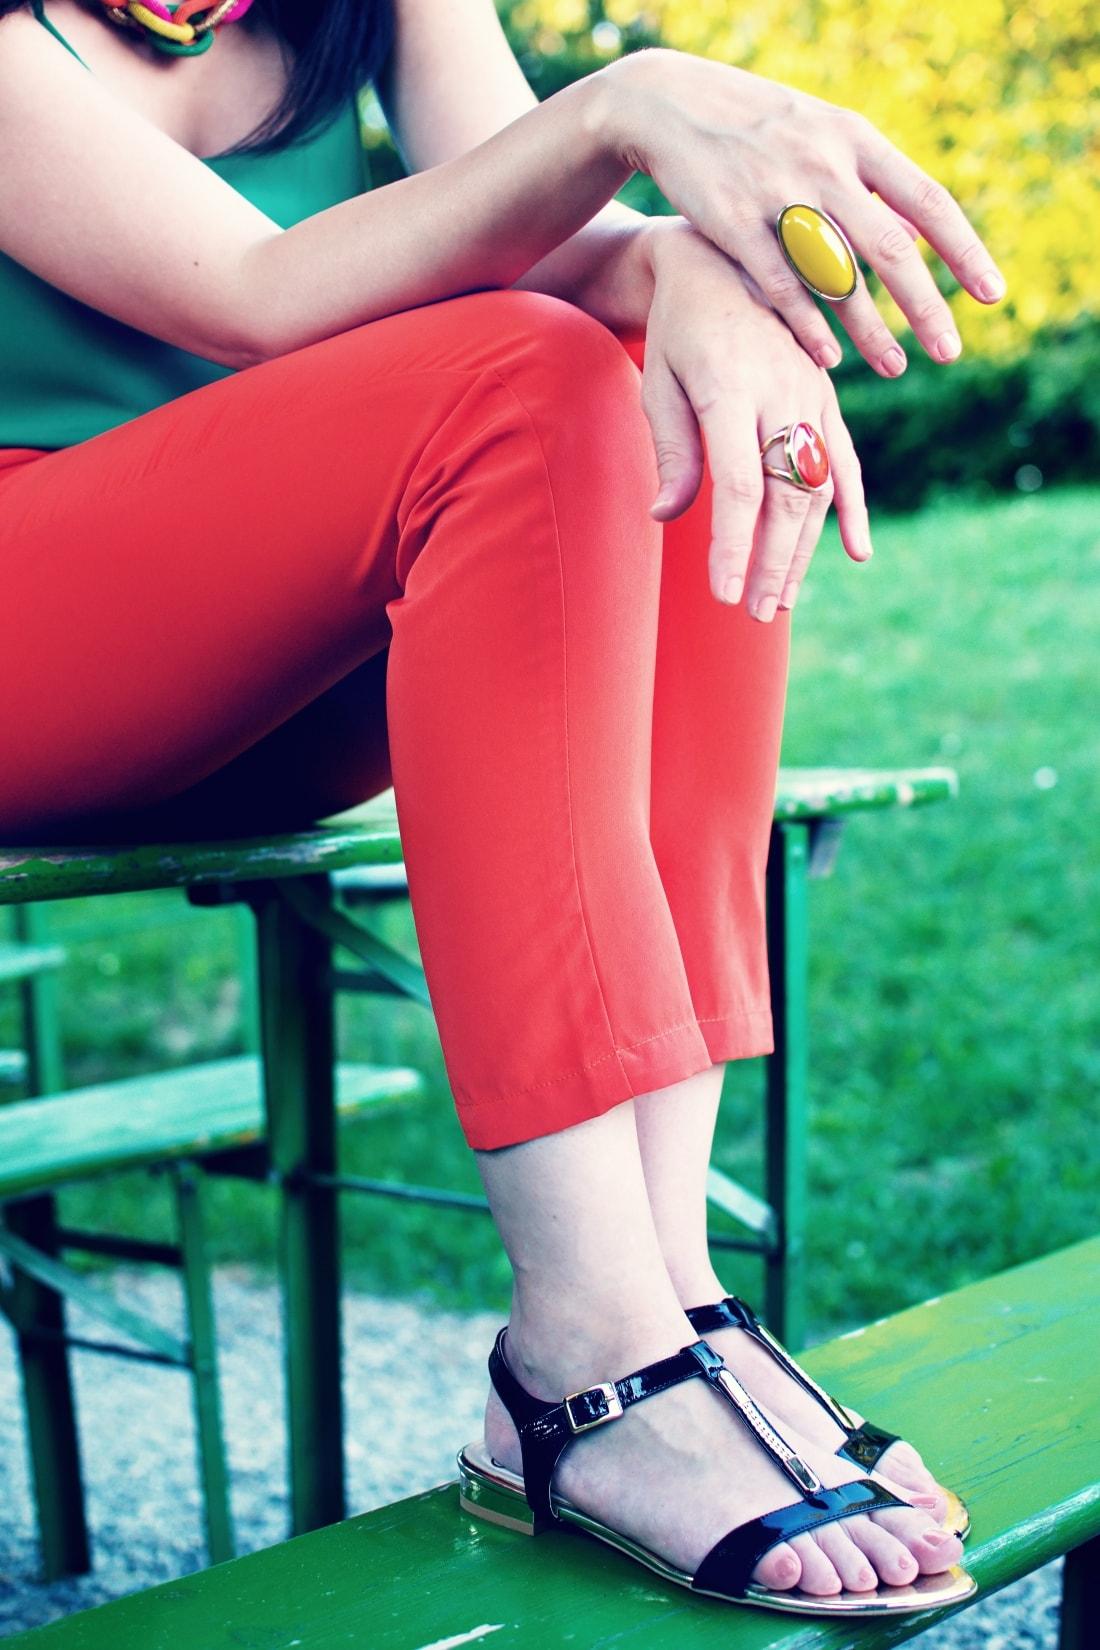 katharine-fashion-is-beautiful-blogger-summer-2